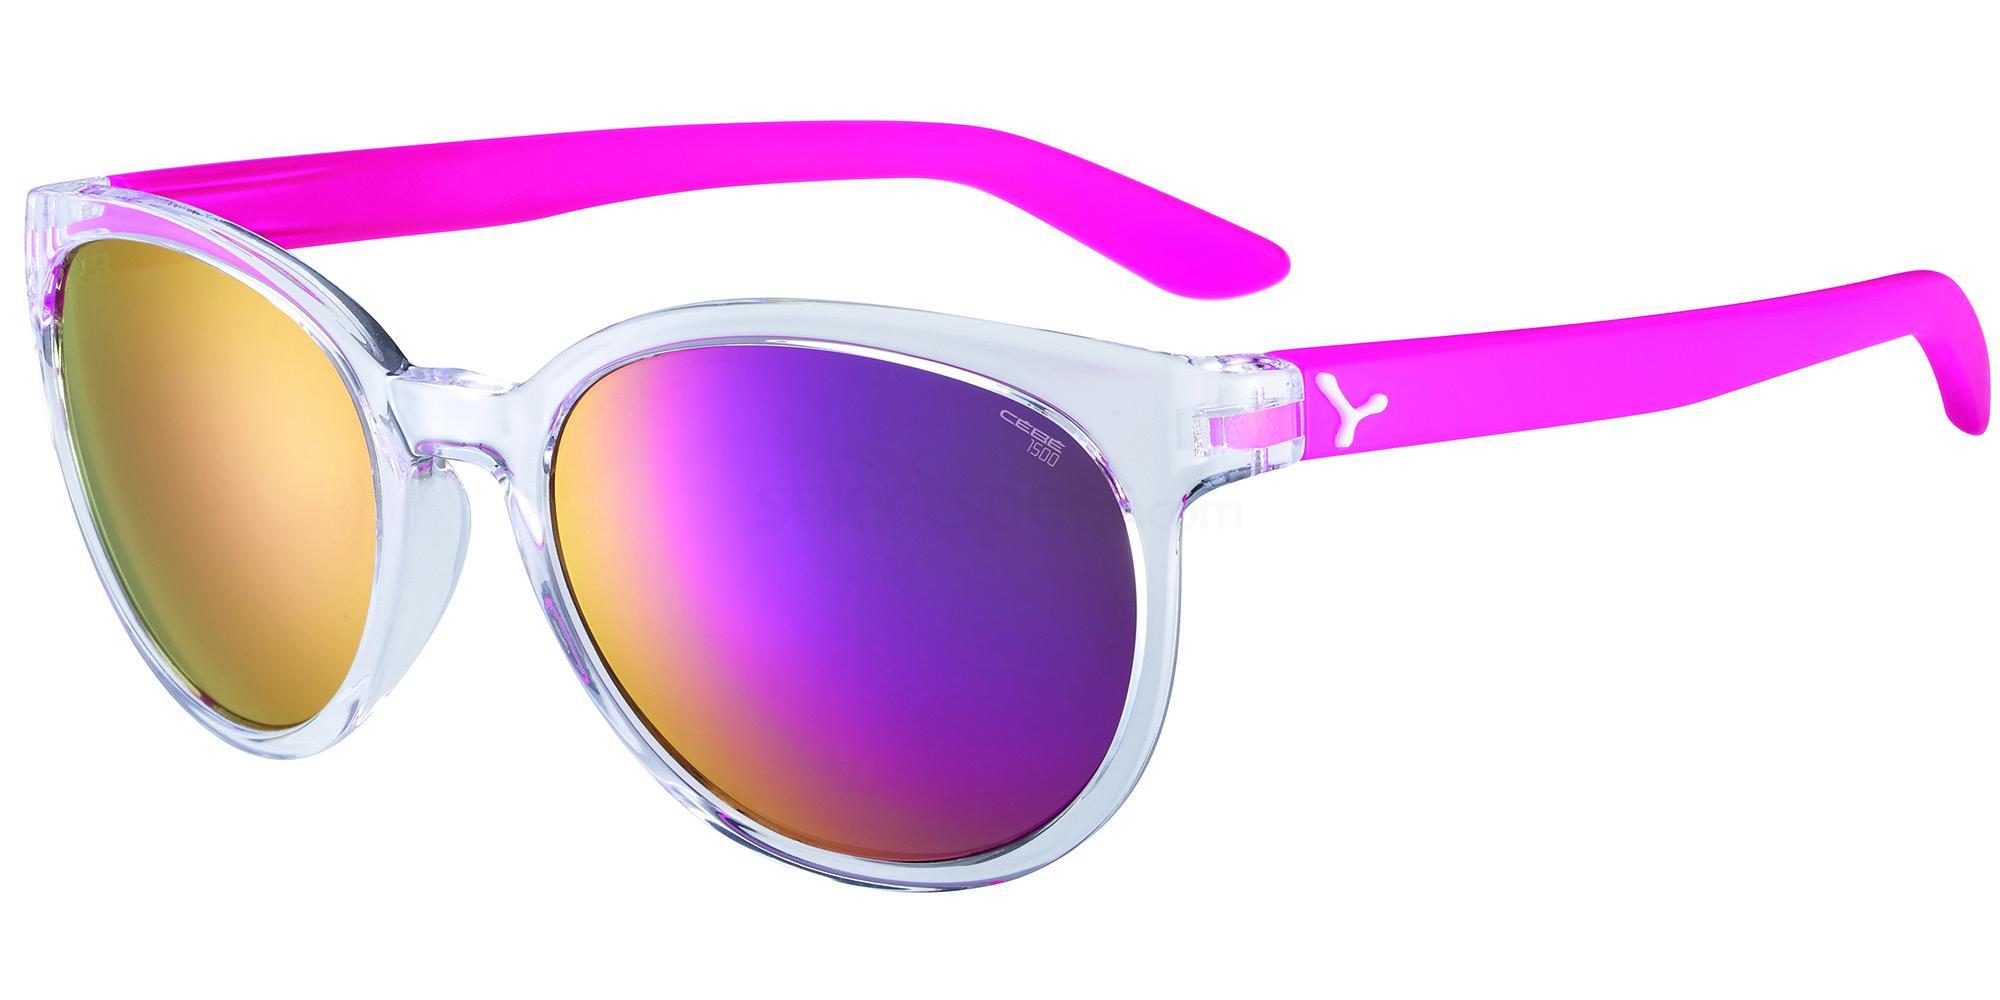 CBSUNRI1 SUNRISE Sunglasses, Cebe